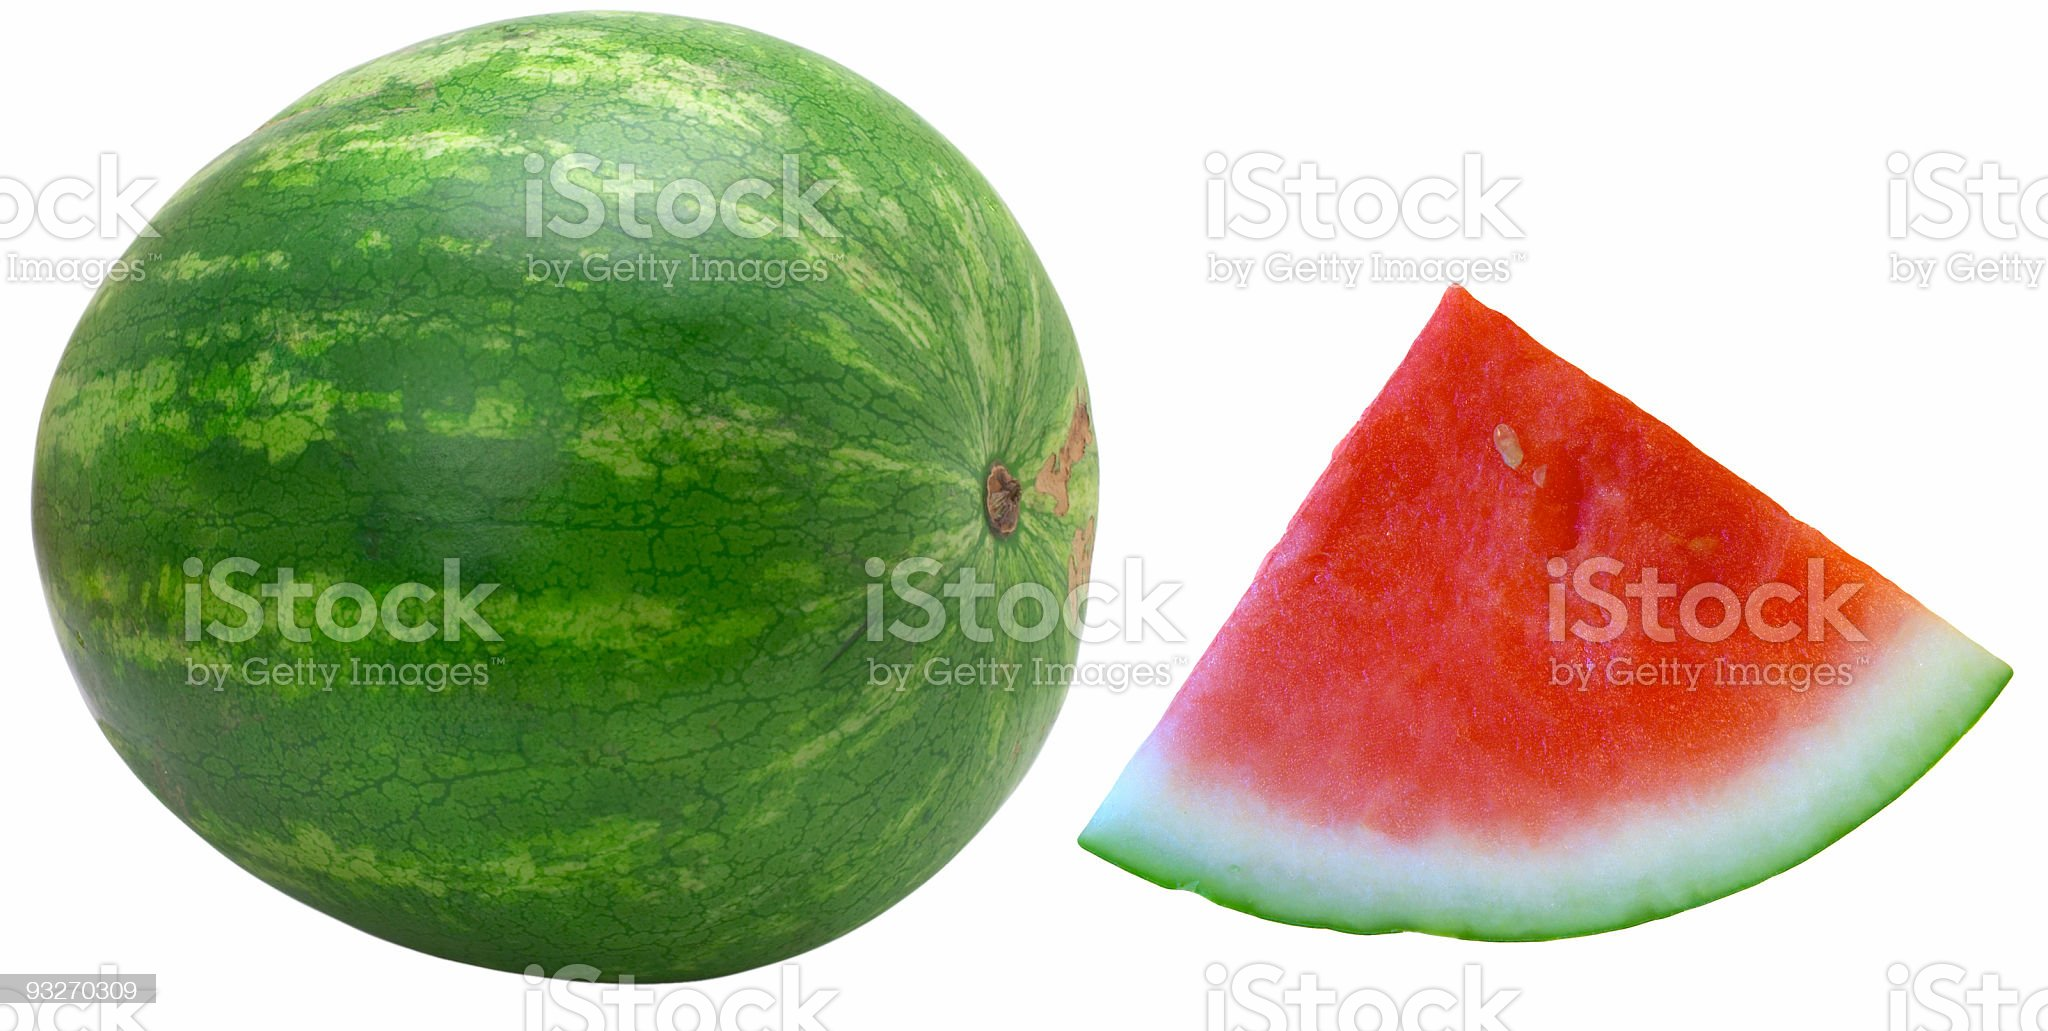 Fruit Objects - Watermelon royalty-free stock photo